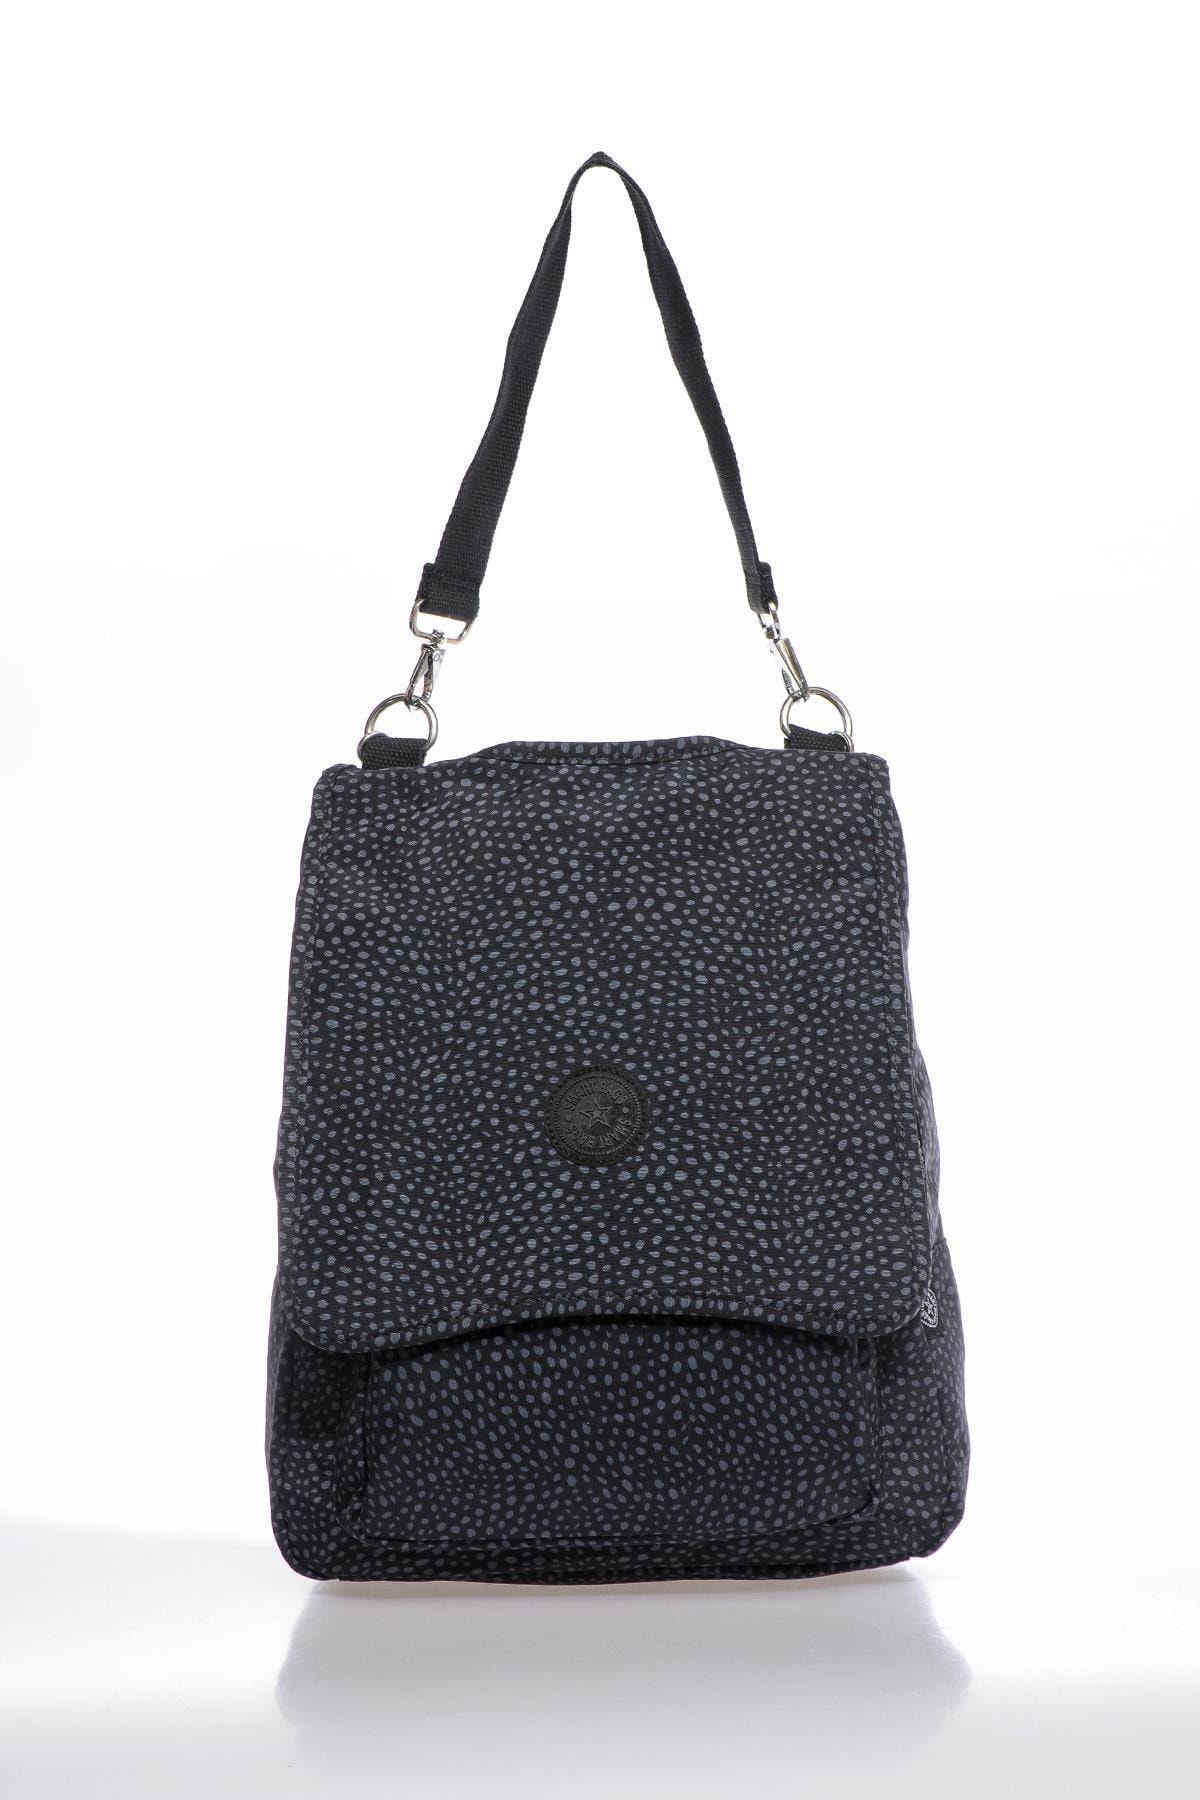 SMART BAGS Smbky1119-0091 Puanlı Siyah Kadın Sırt Çantası 1